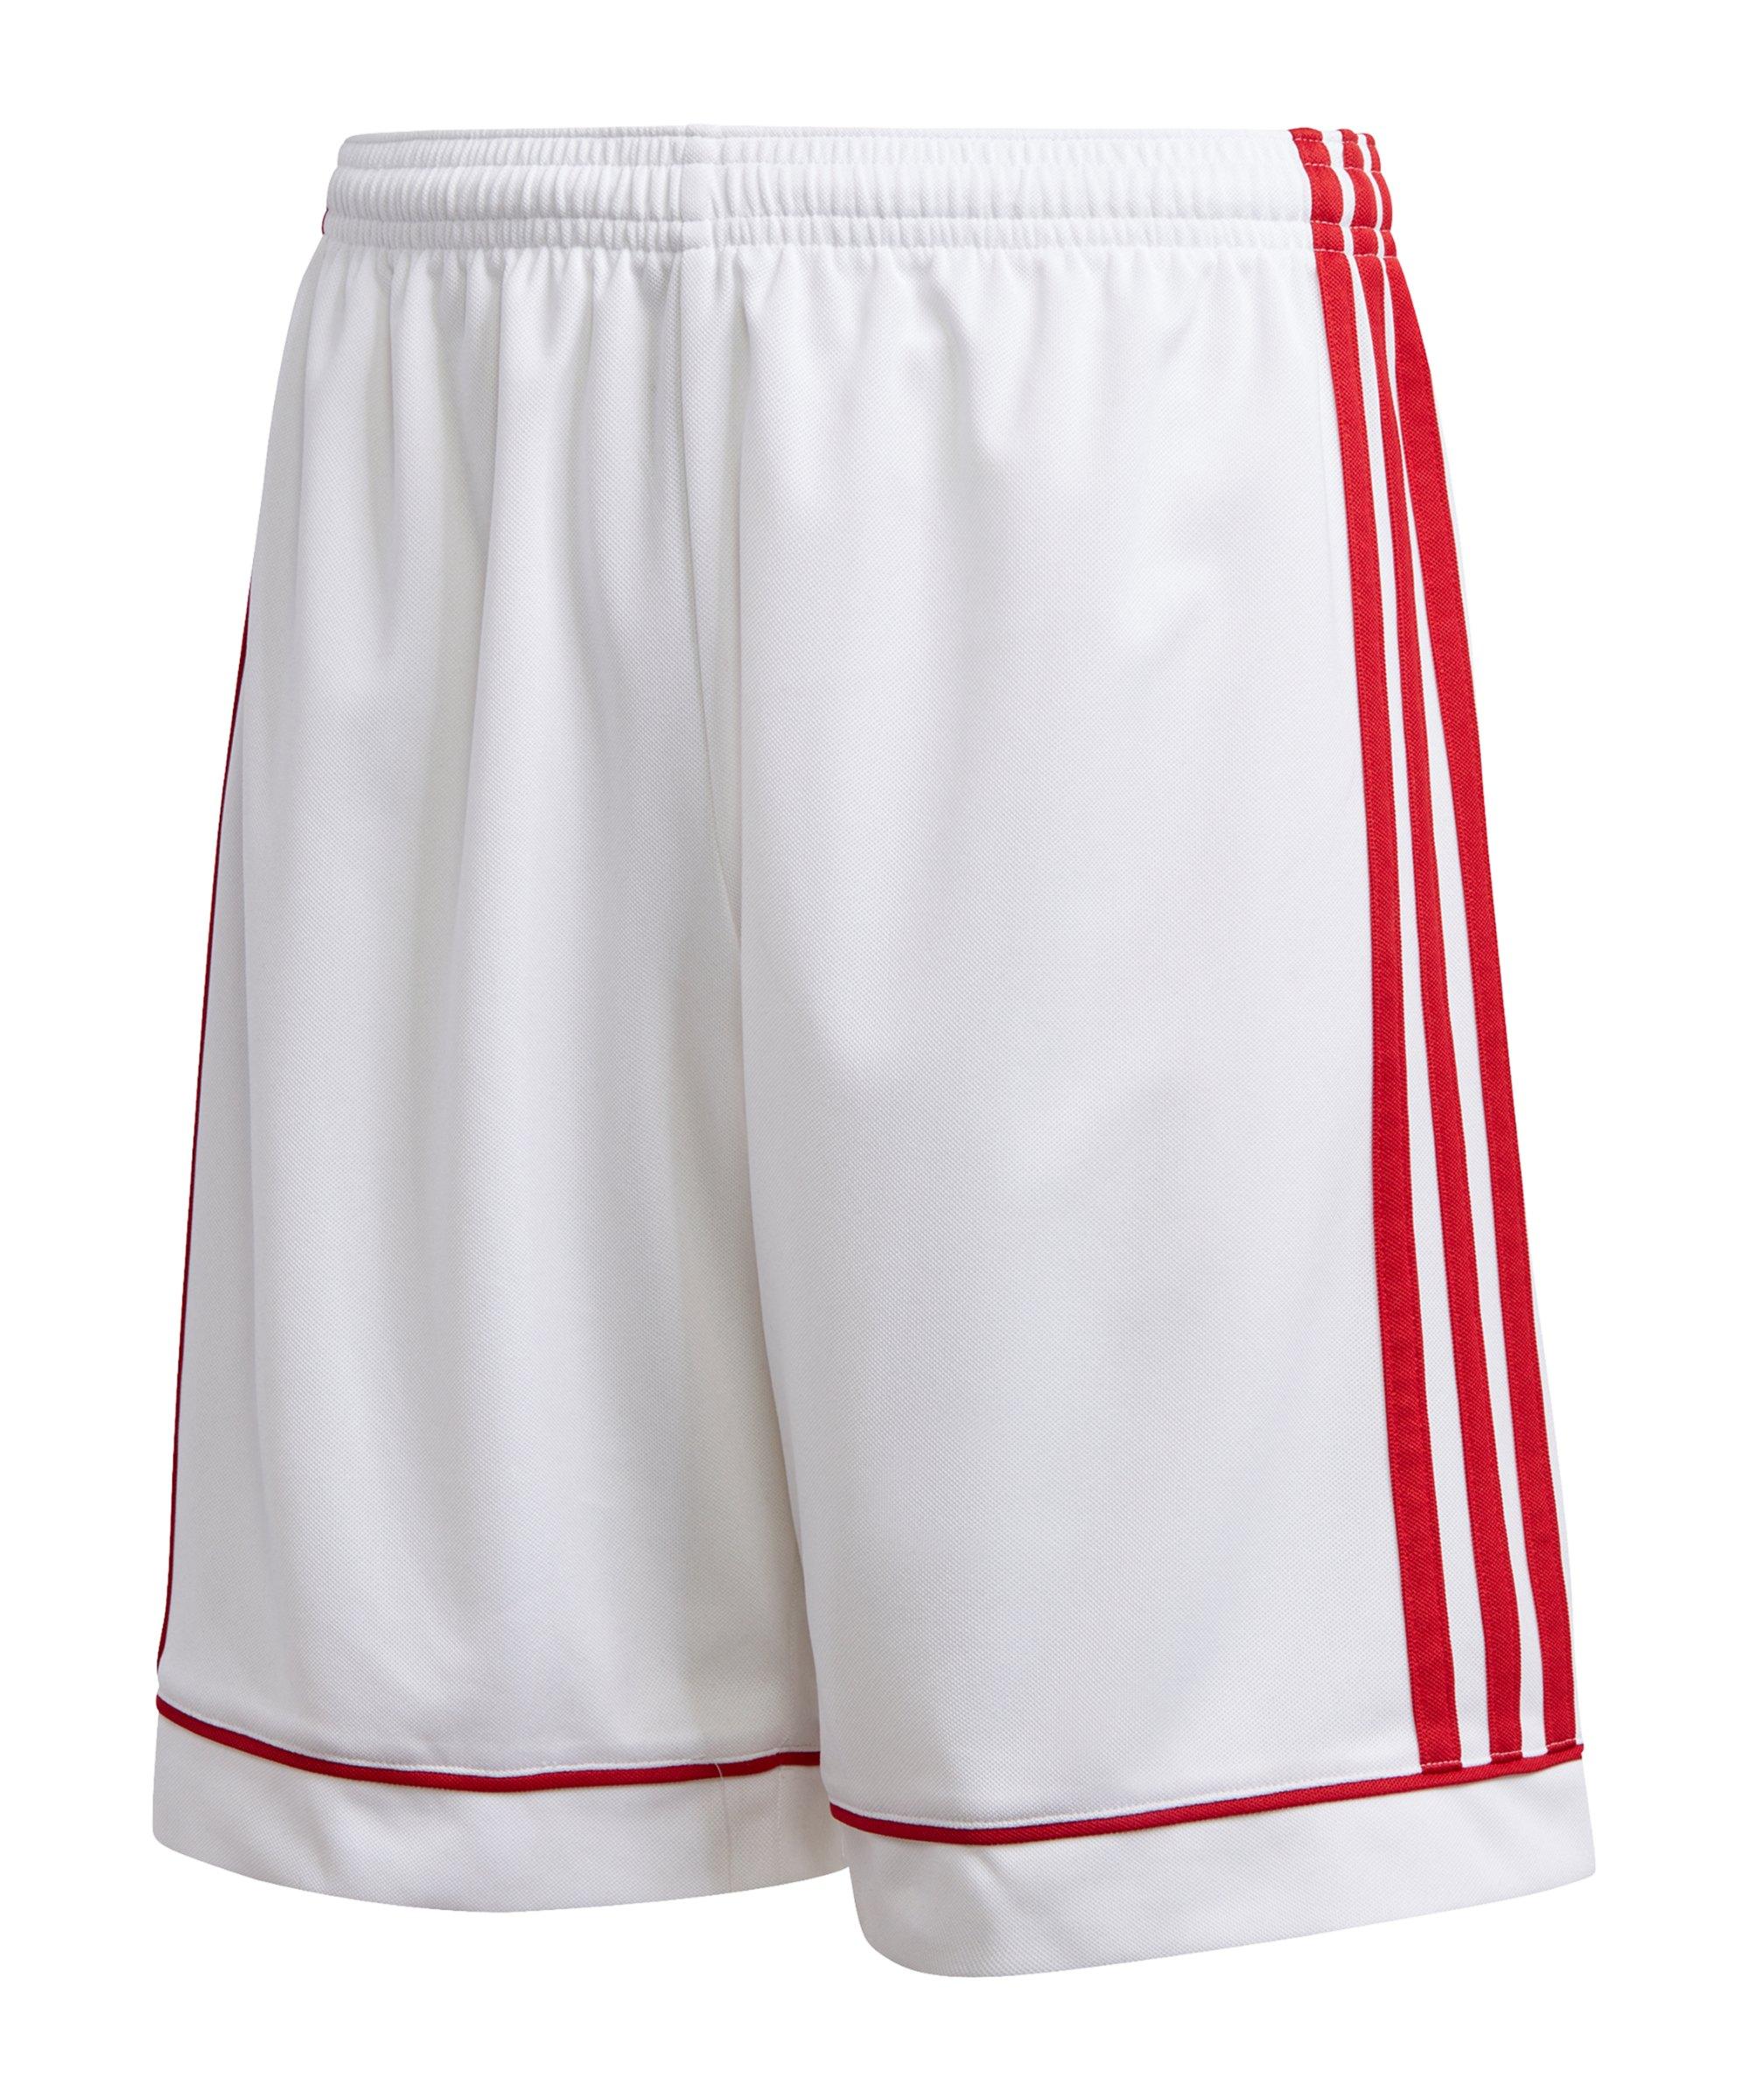 adidas Squad 17 Short Kids Weiss Rot - weiss